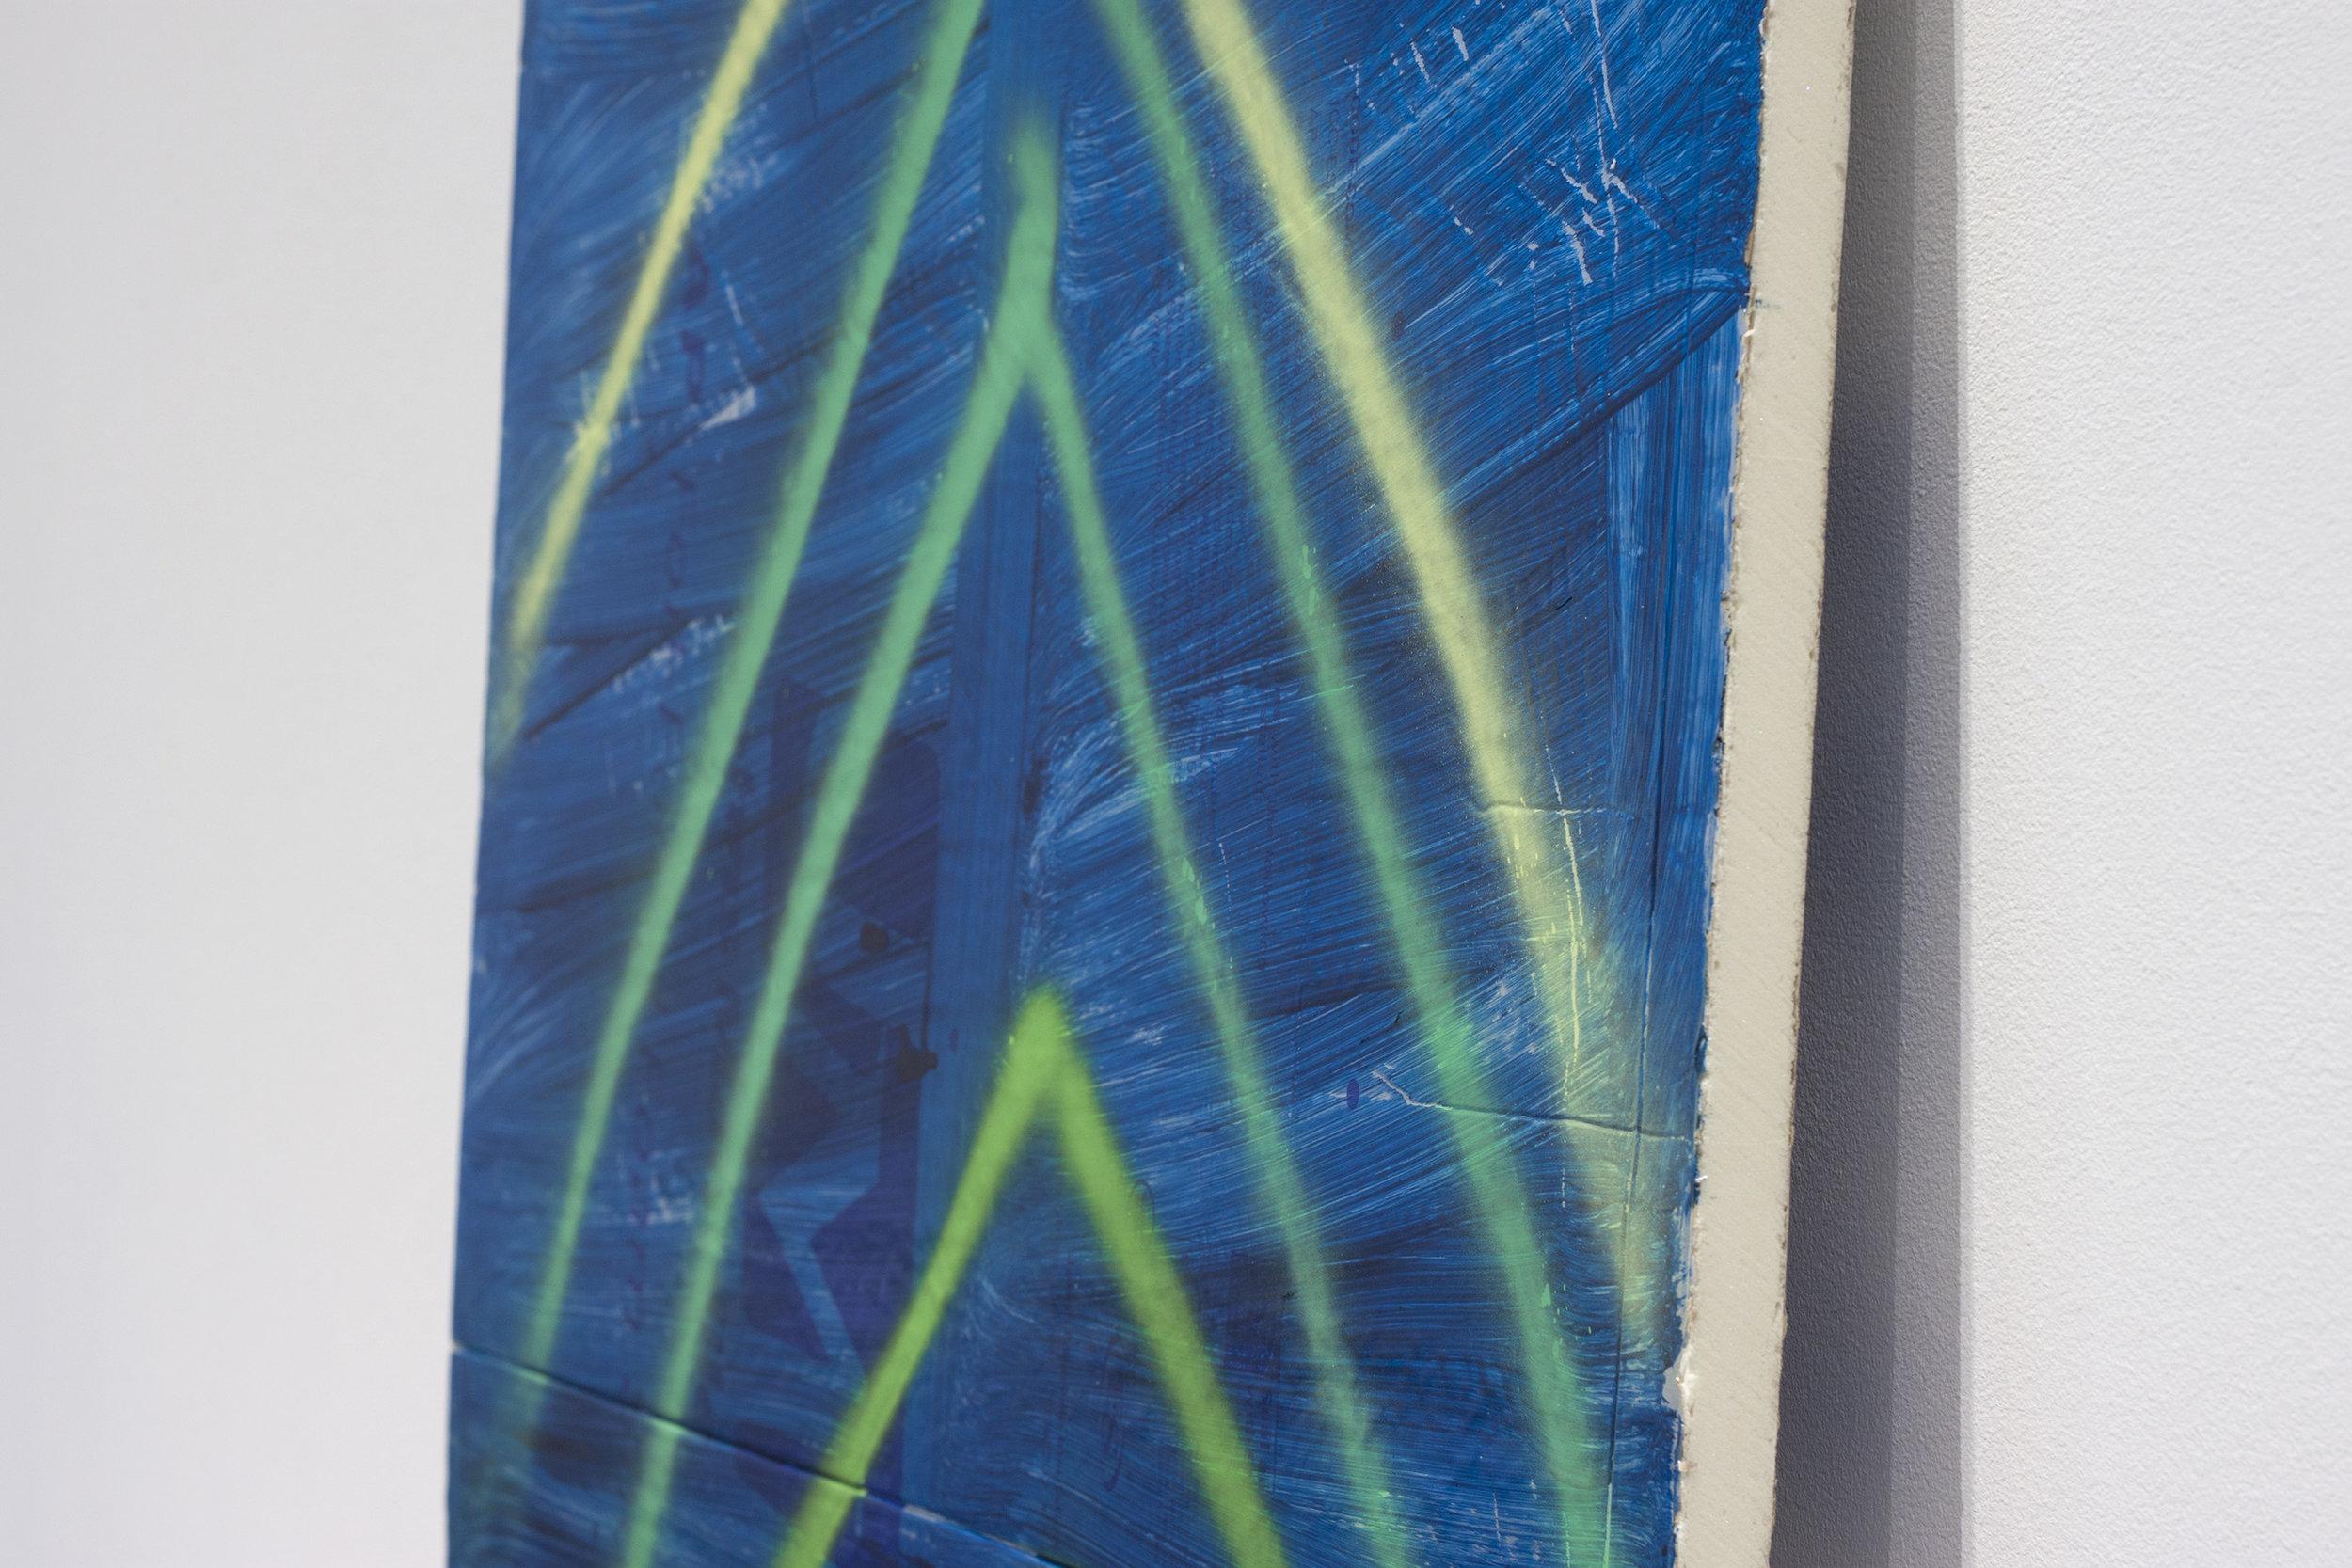 Aurora Borealis   Acrylic on aluminum-faced rigid foam board.  42 x 48 inches. 2016.